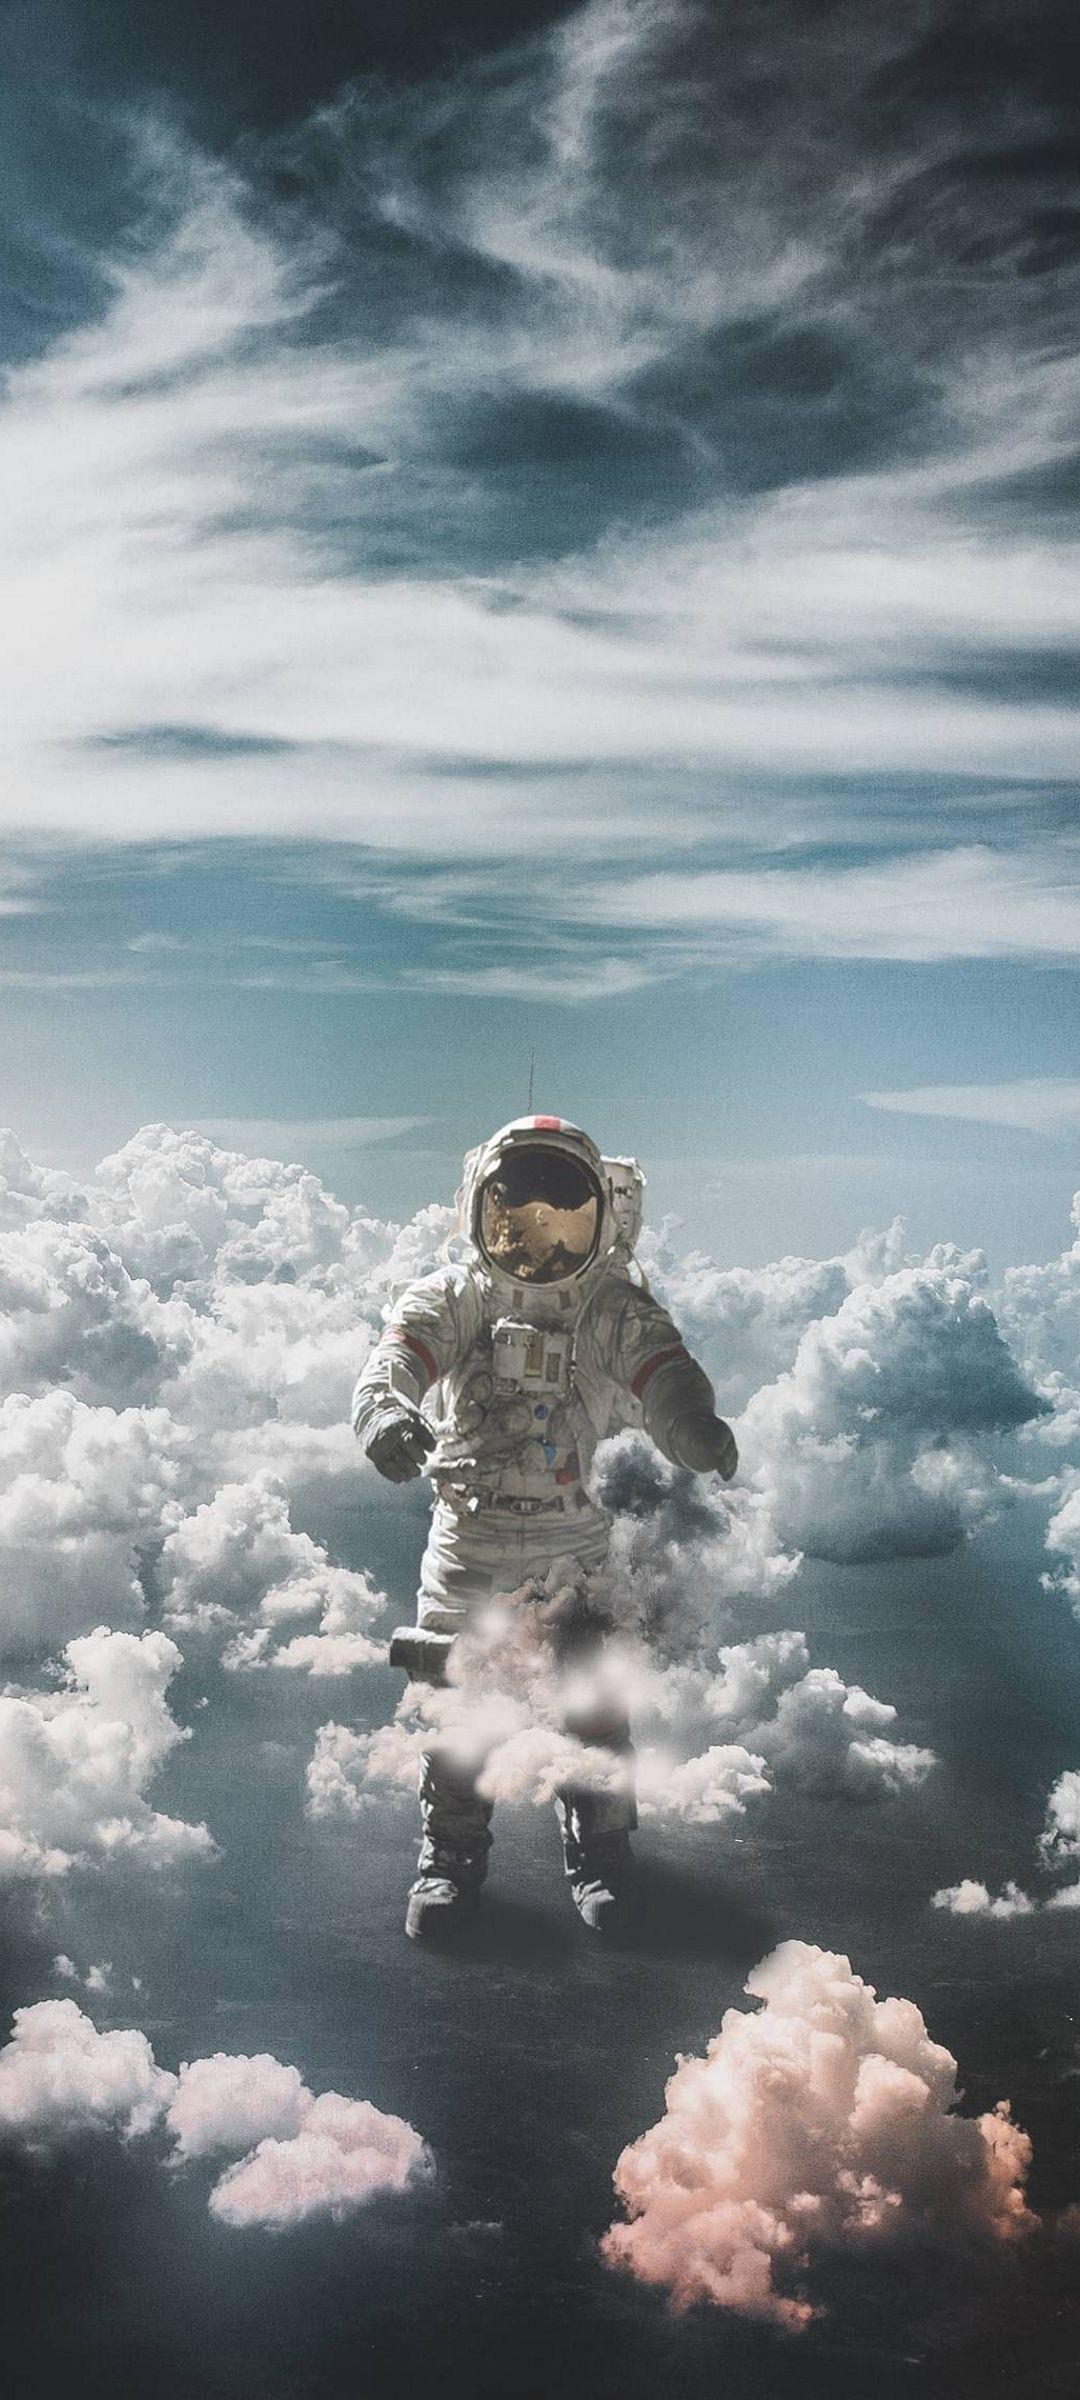 Astronaut Suit Space Clouds